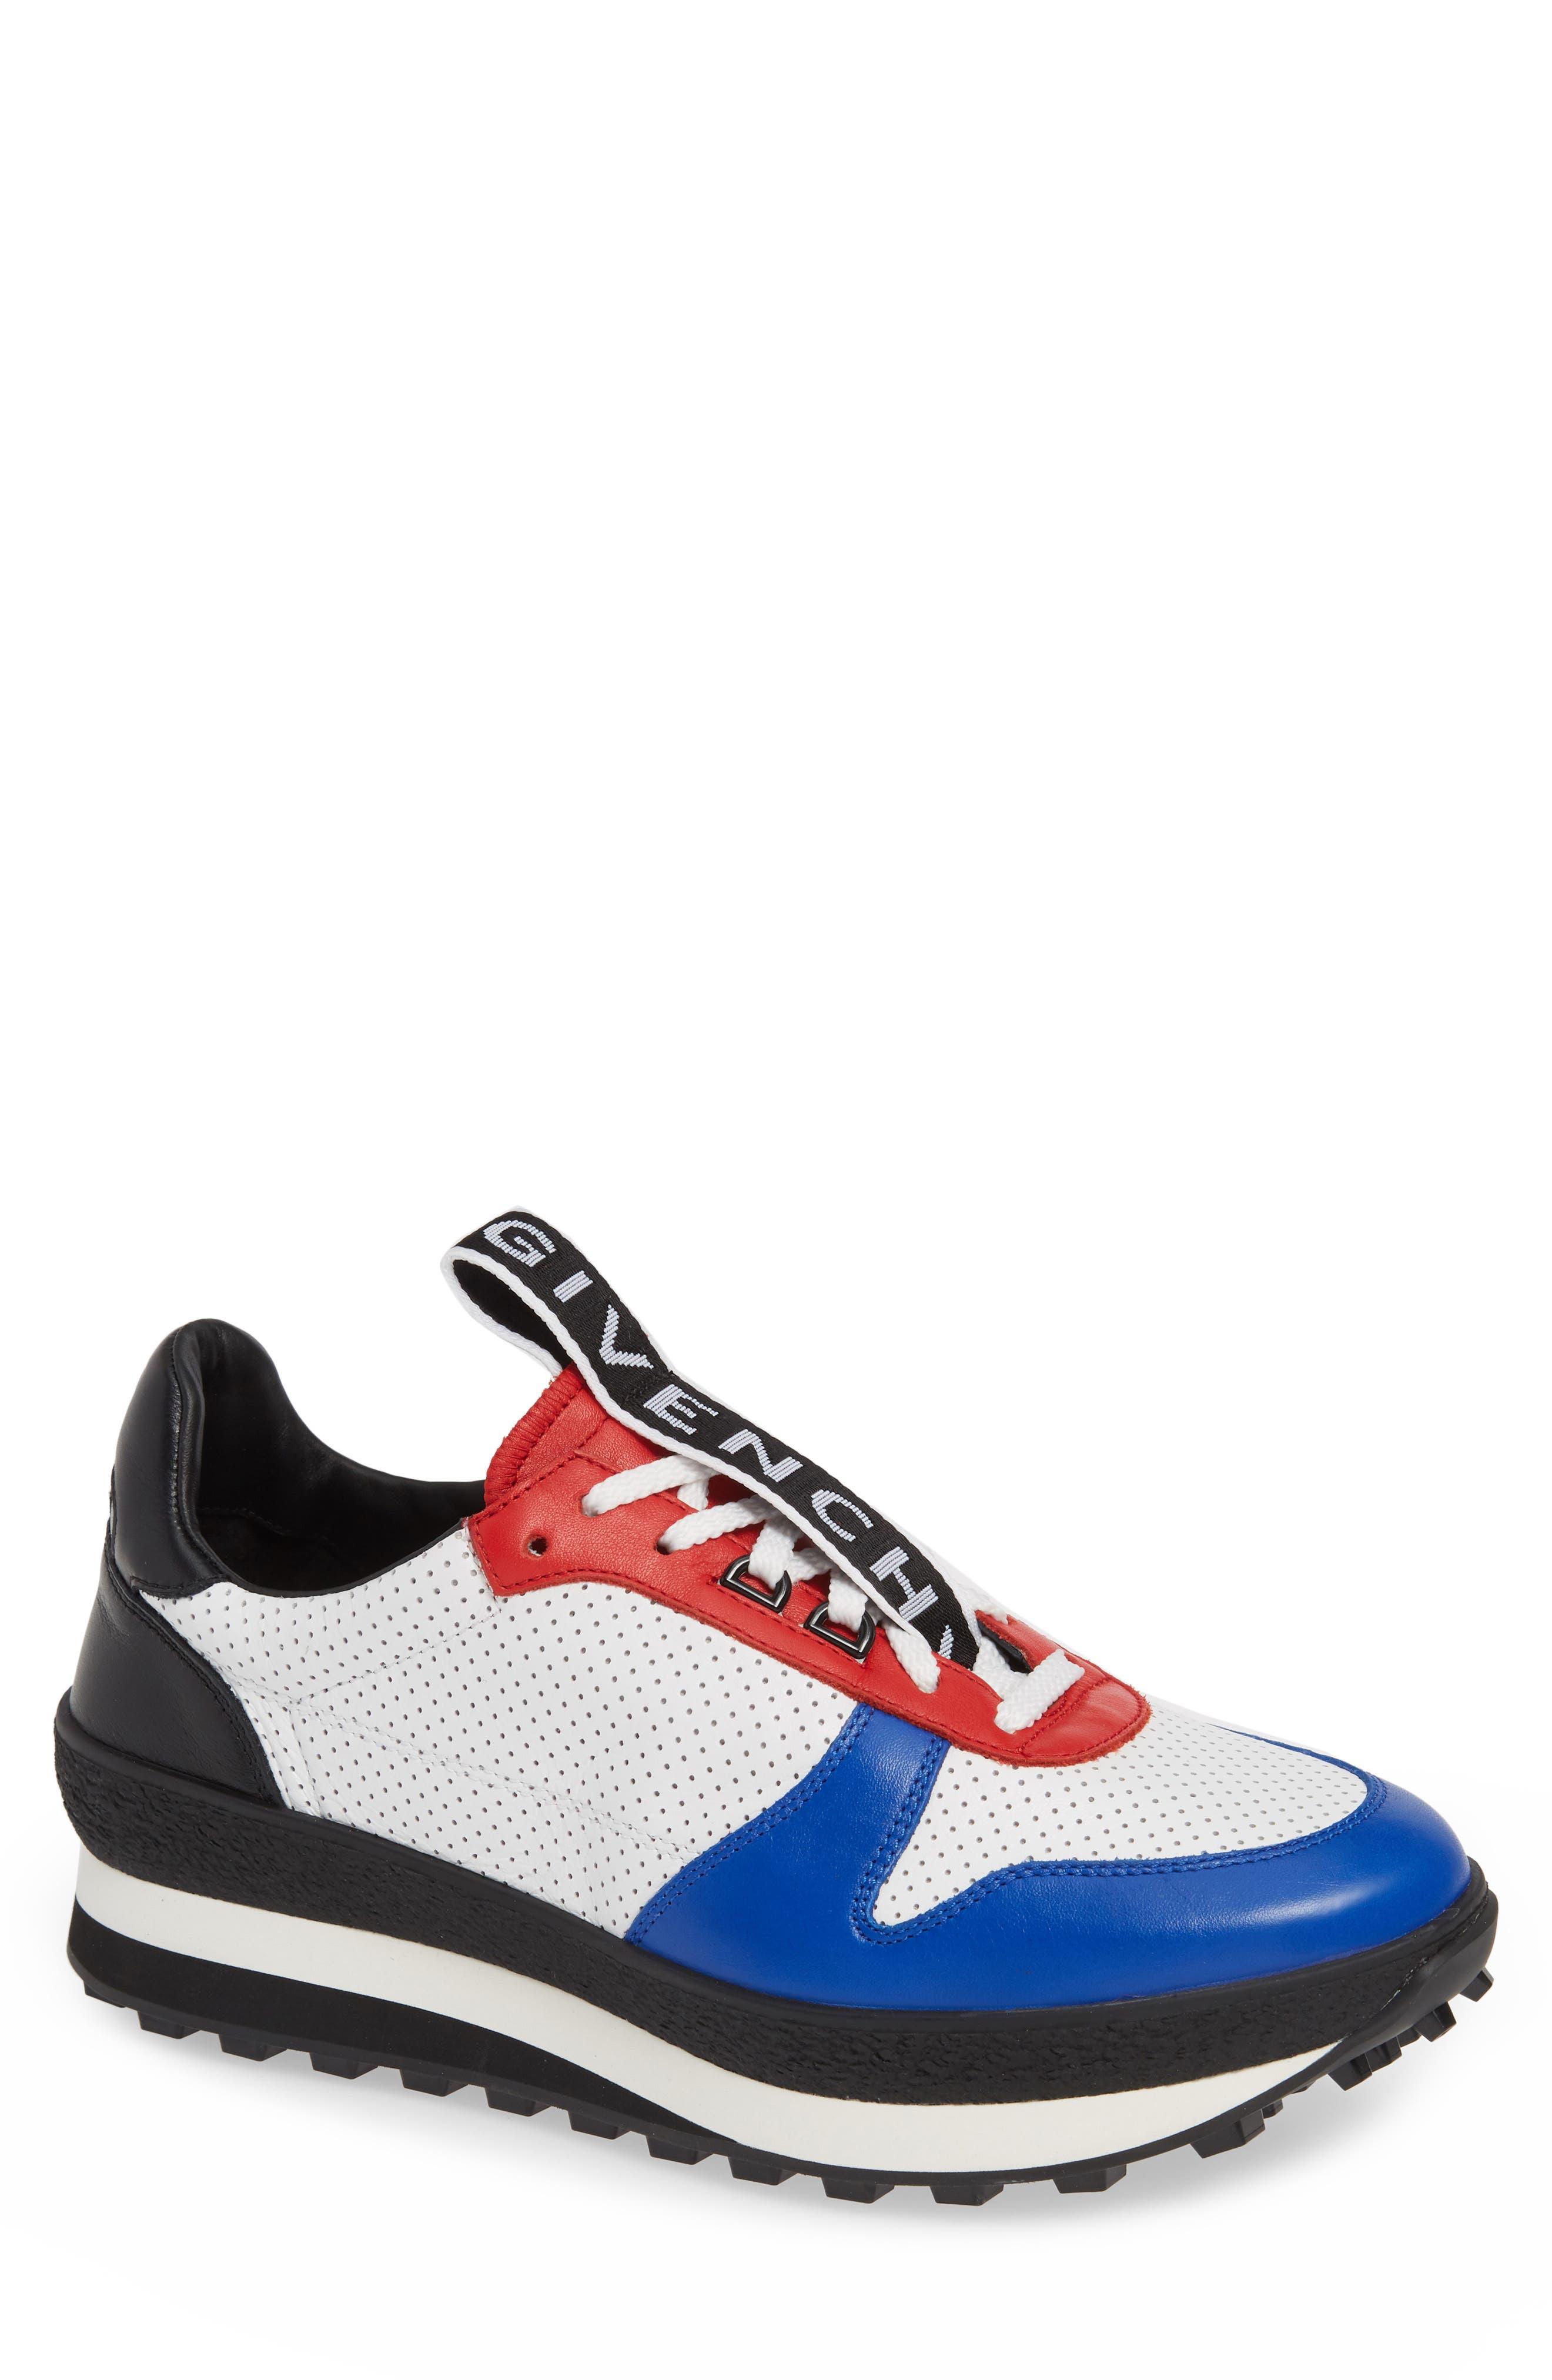 TR3 Low Runner Sneaker,                         Main,                         color, WHITE/ RED/ BLACK